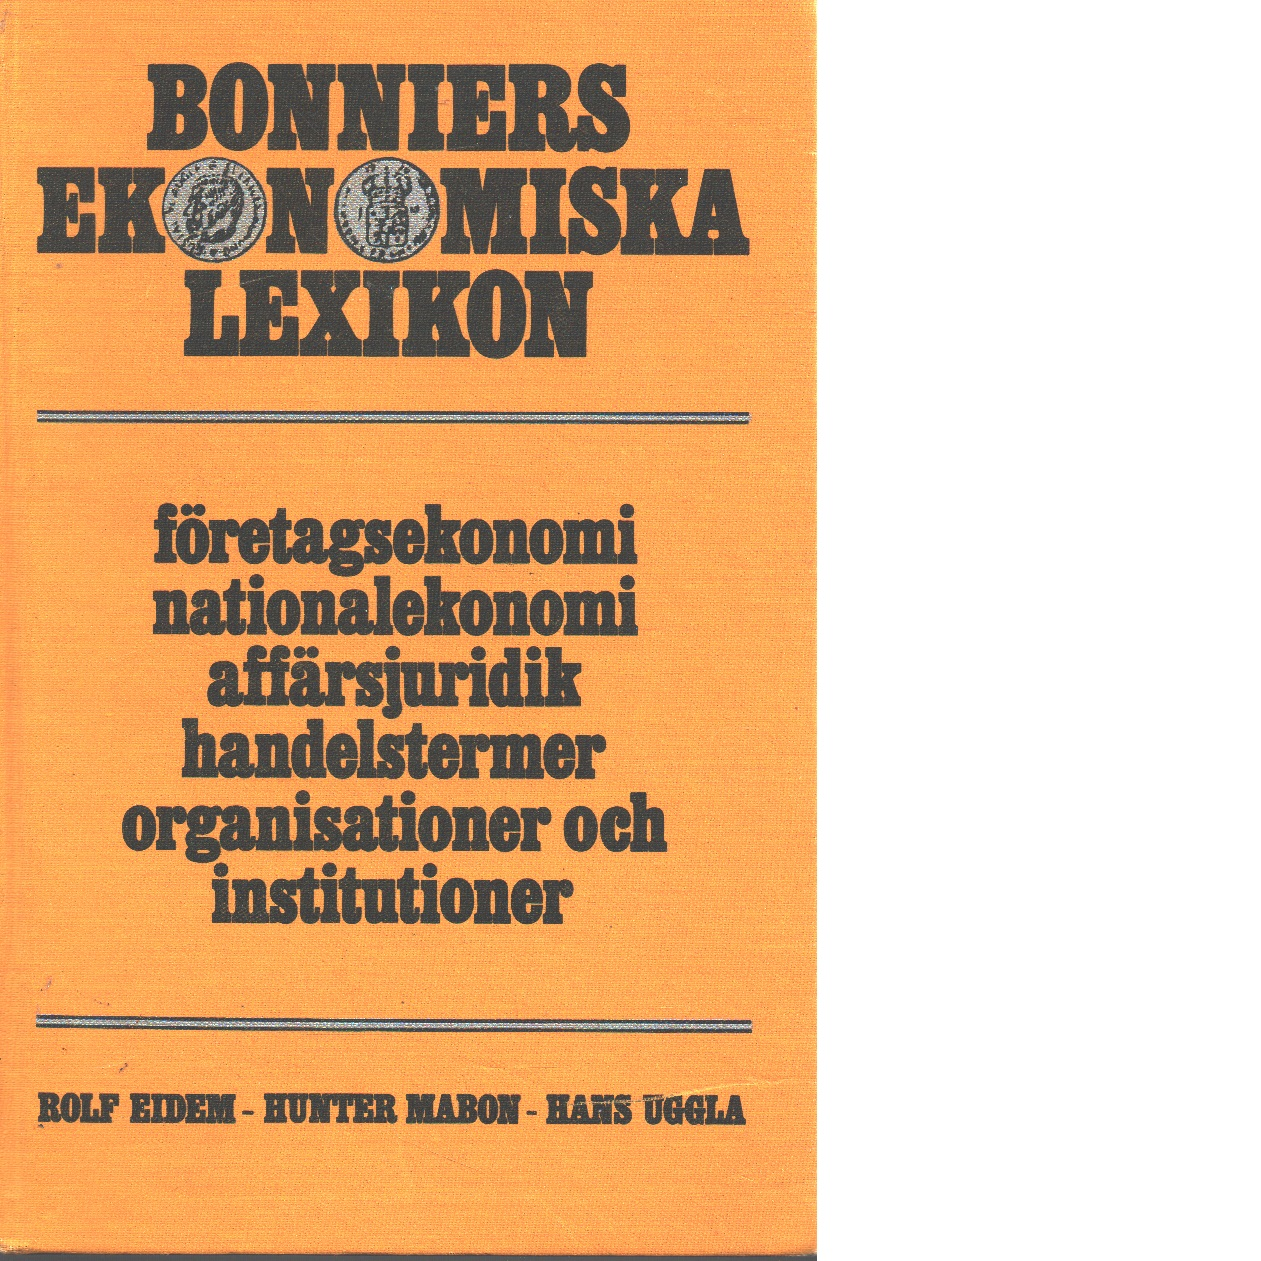 Bonniers ekonomiska lexikon - Red.